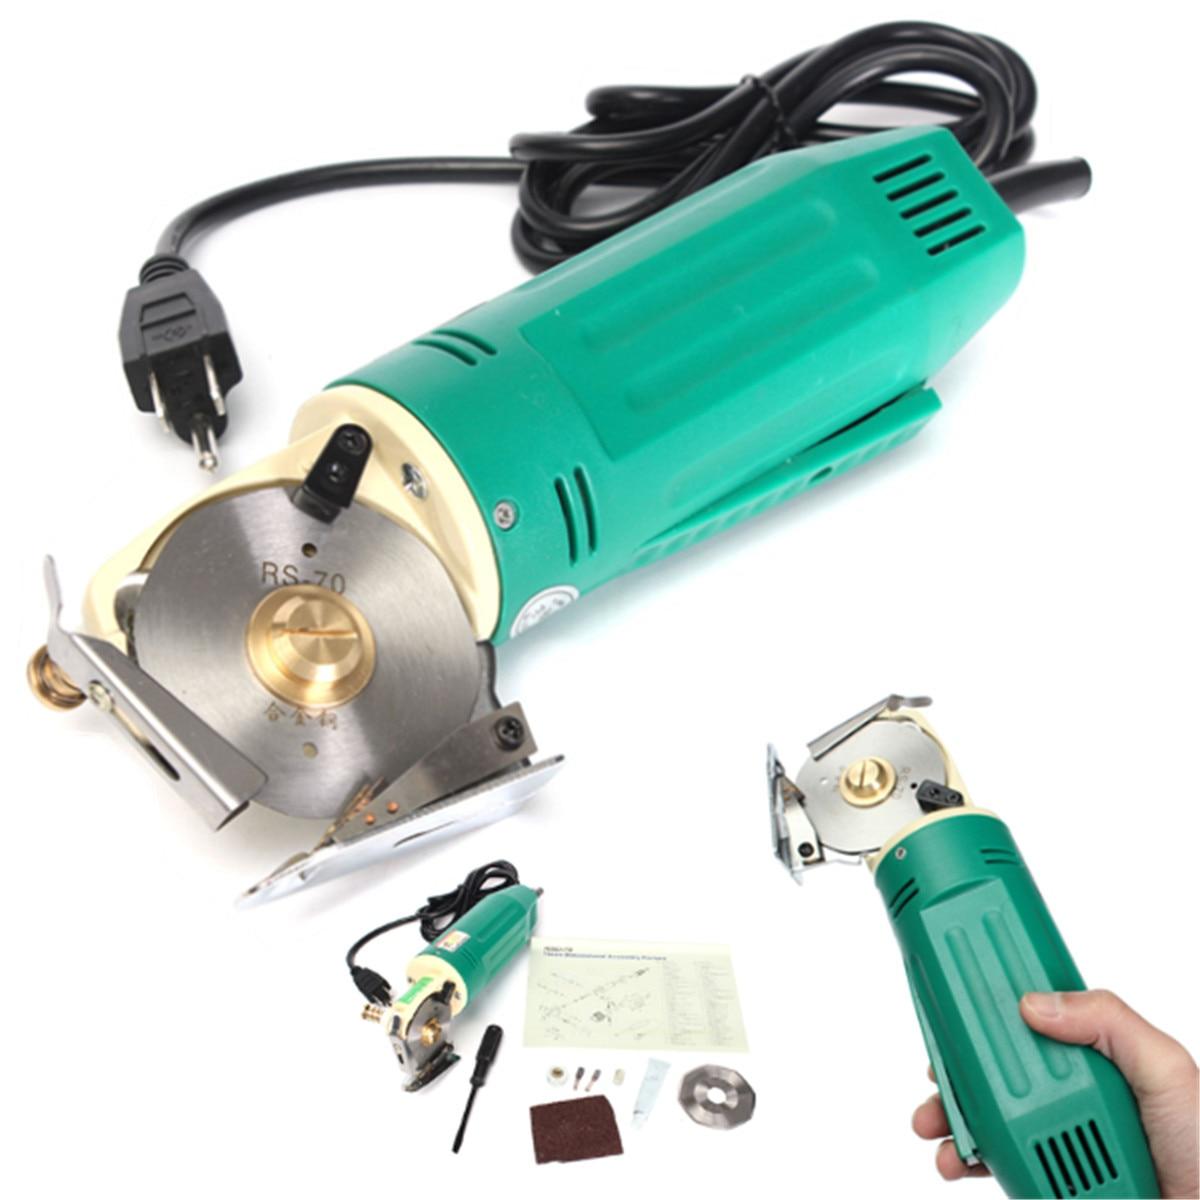 70MM 220V Electric Shear Rotary Round Blade Fabric Cloth Cutter Cutting Machine